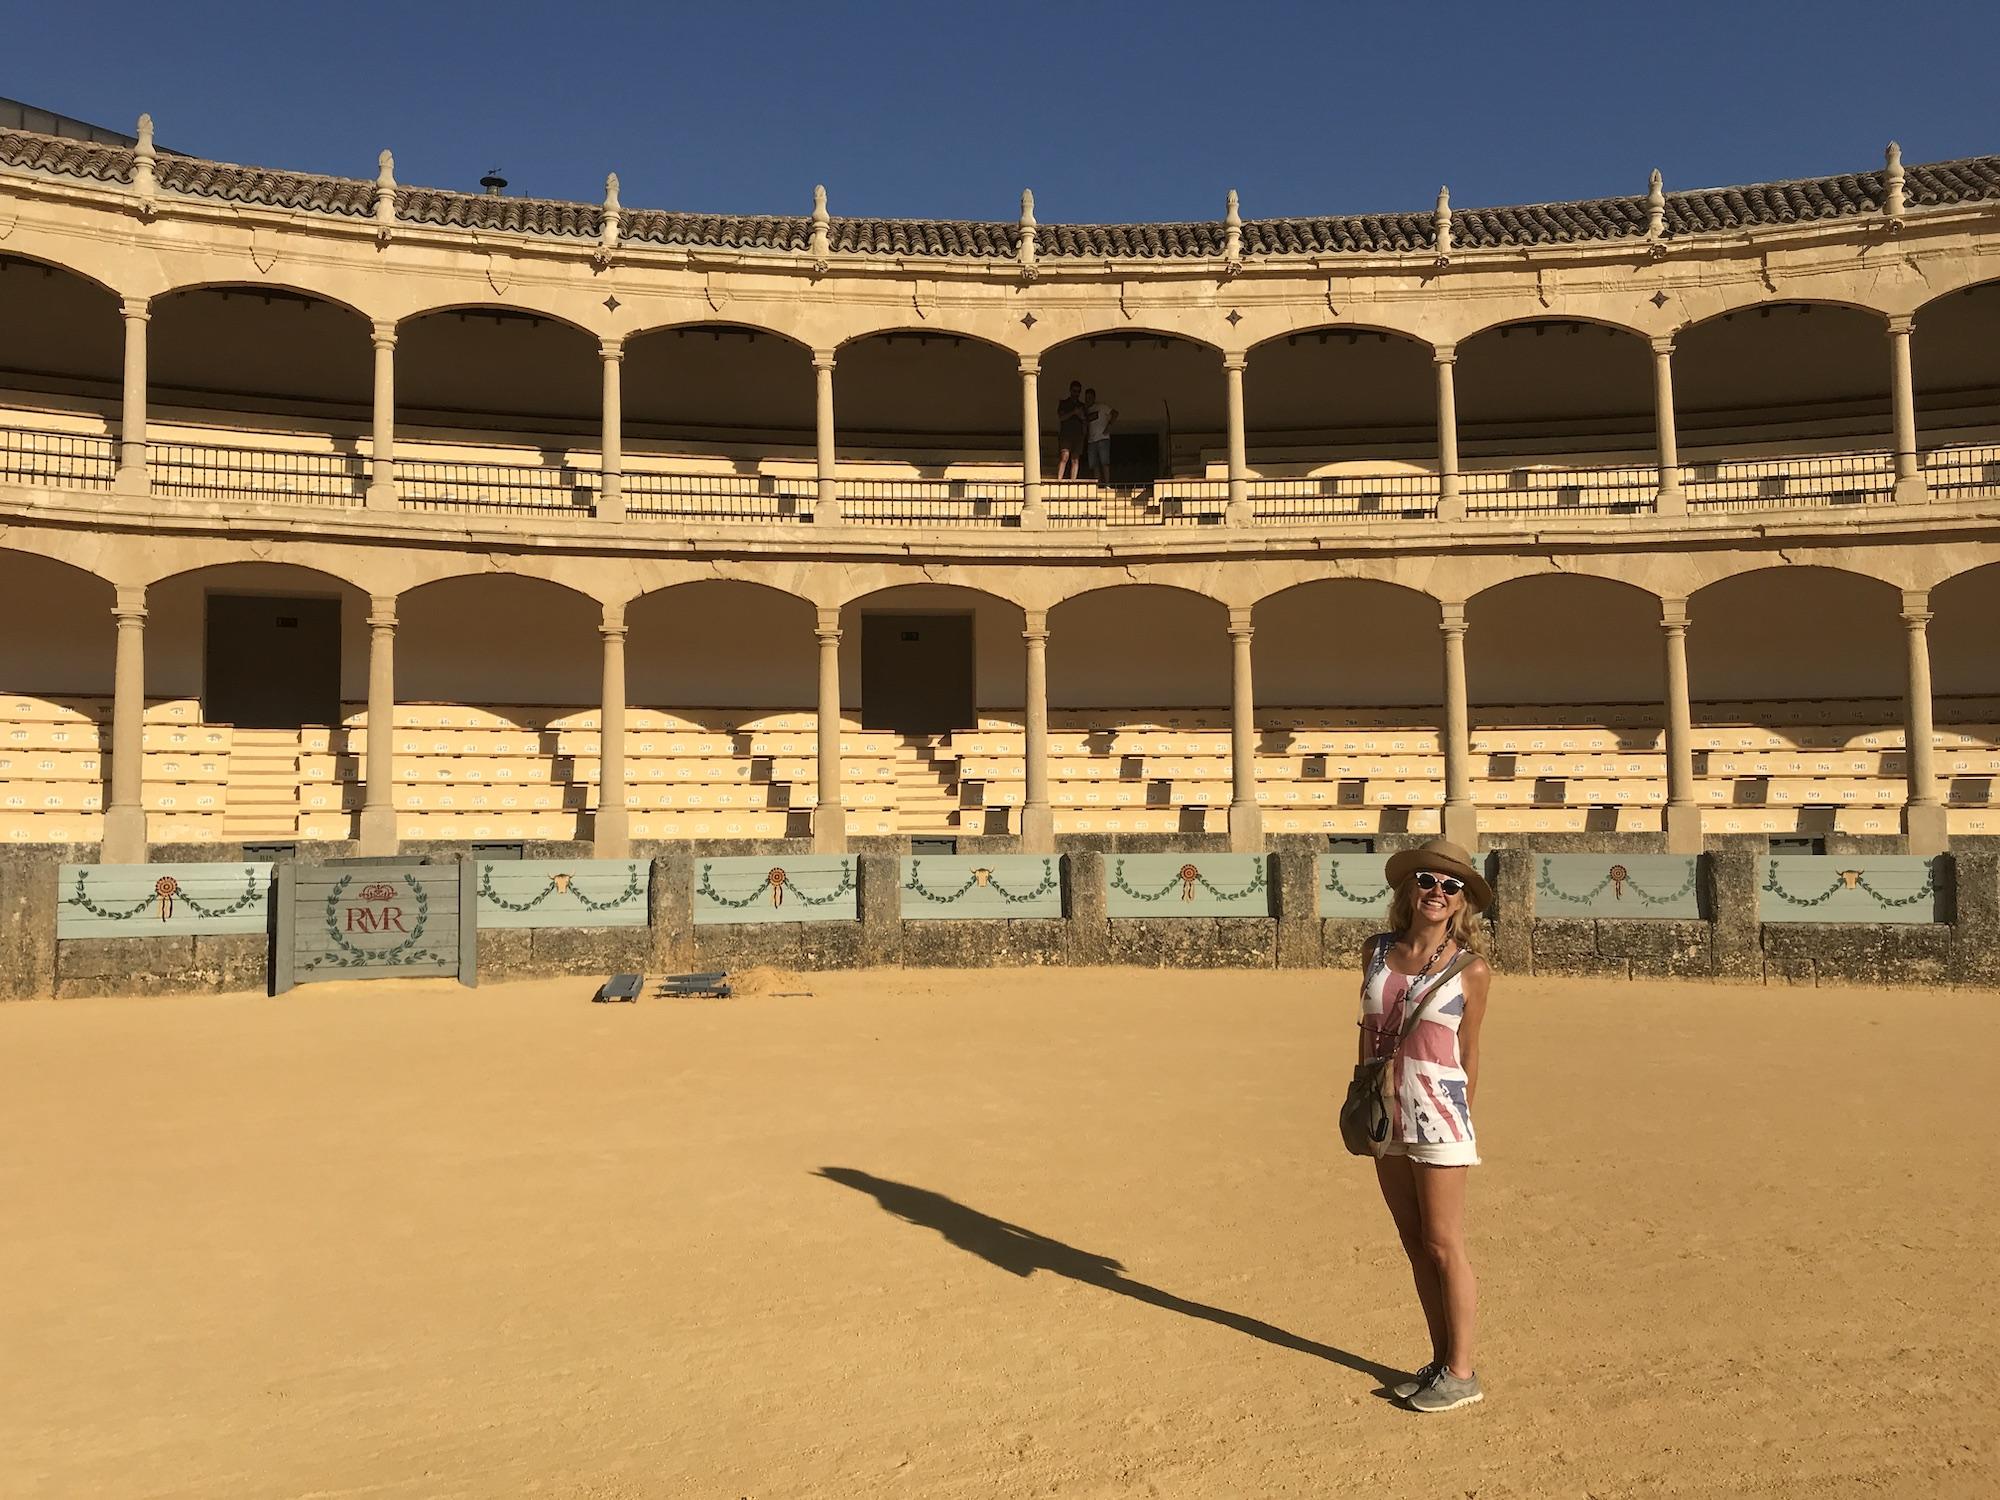 Plaza de Toros. Ronda, Spain